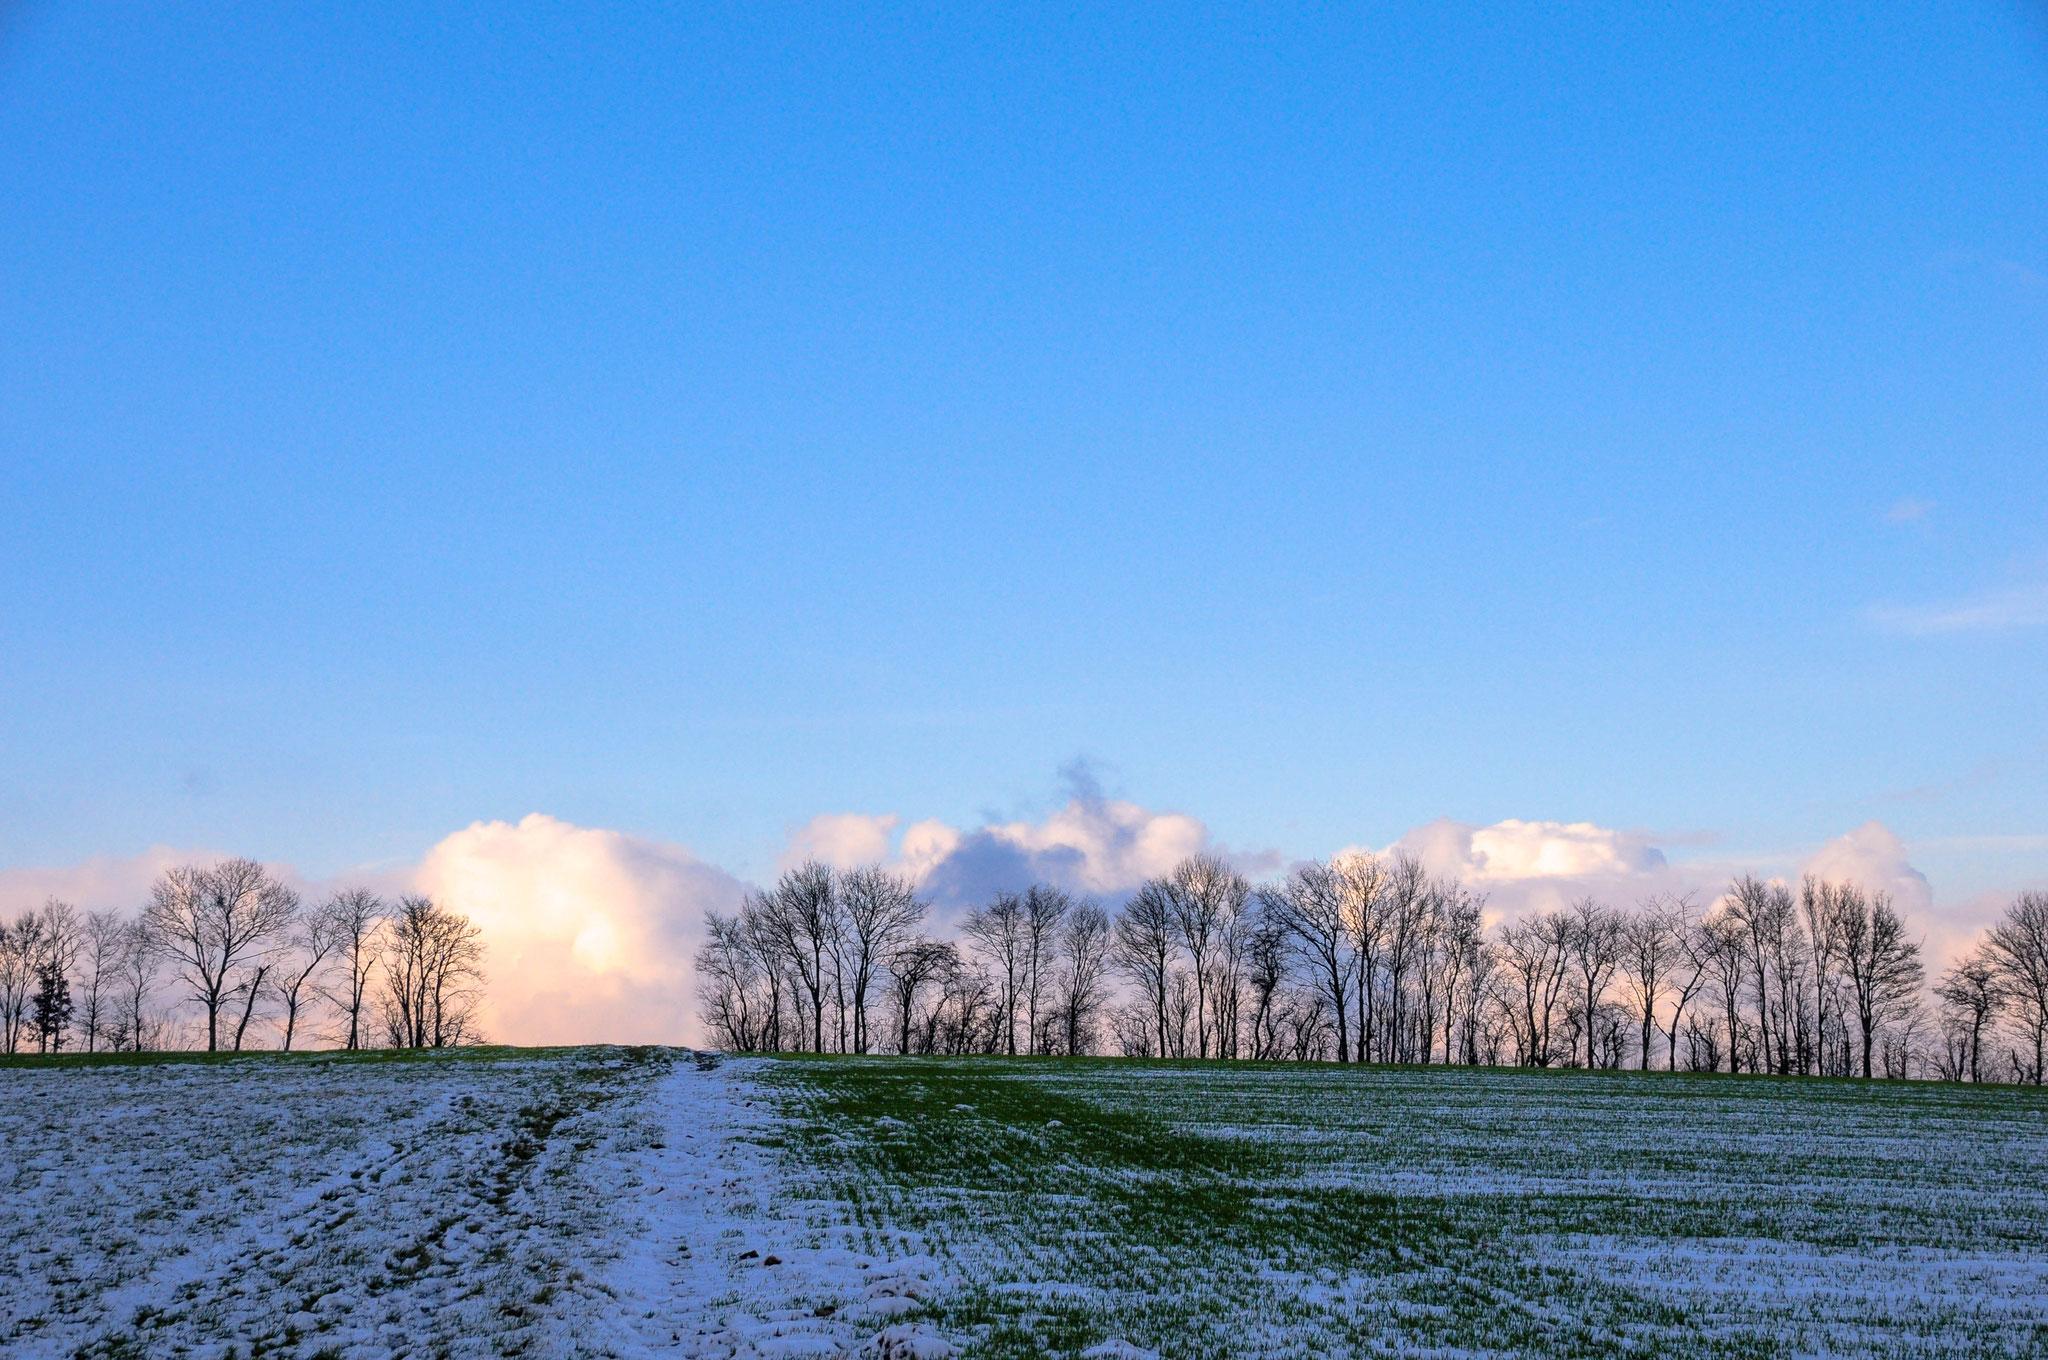 Winter, 01.12.2017